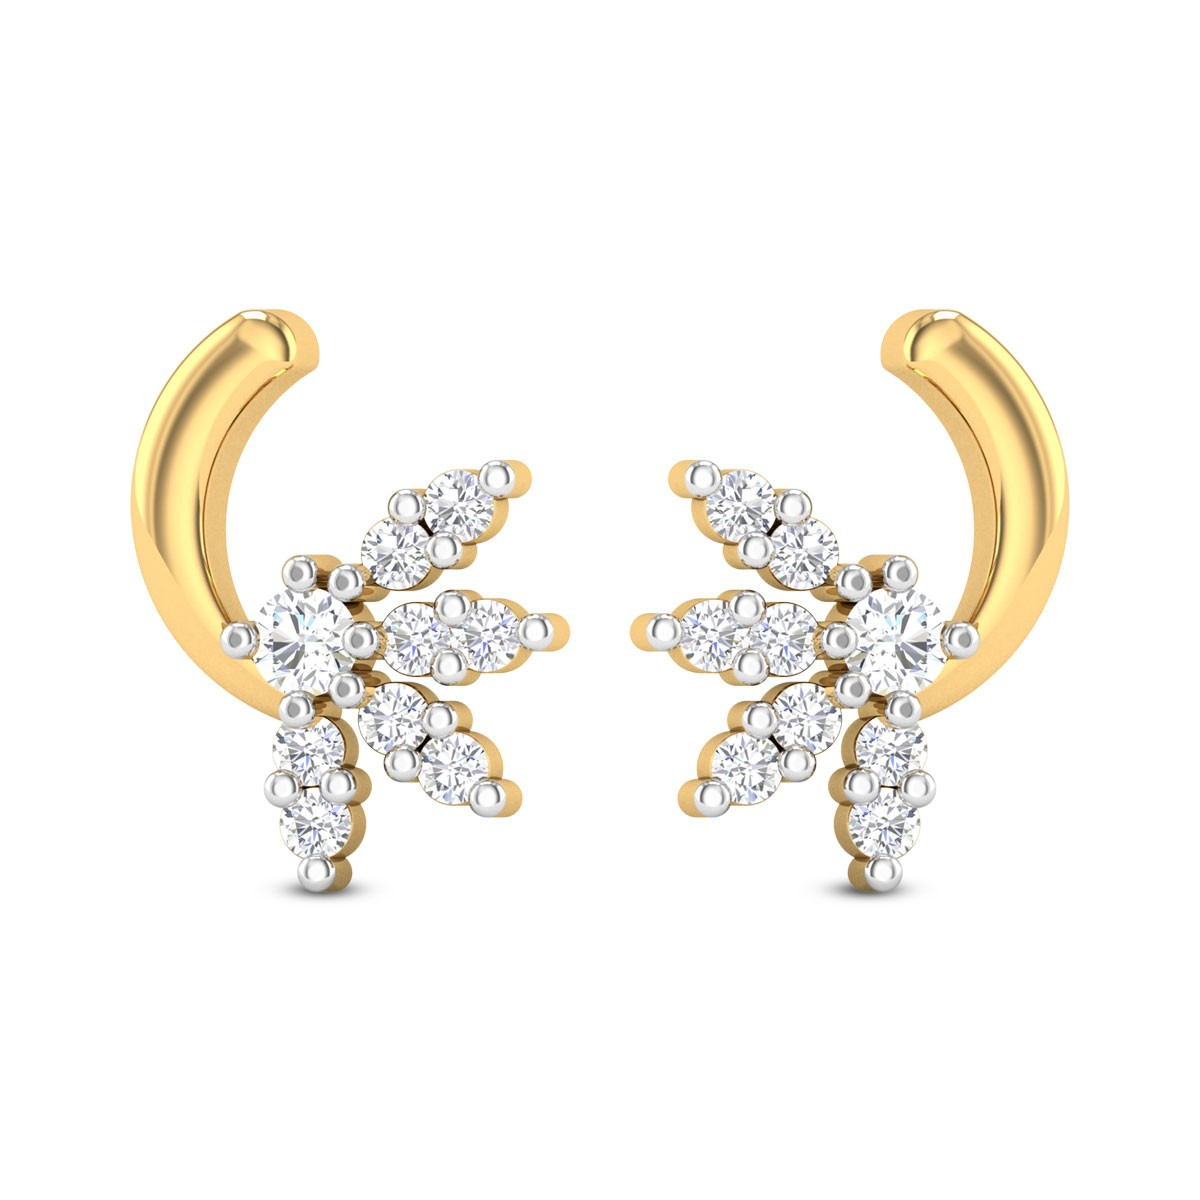 Kaia Curved Floral Diamond Stud Earrings